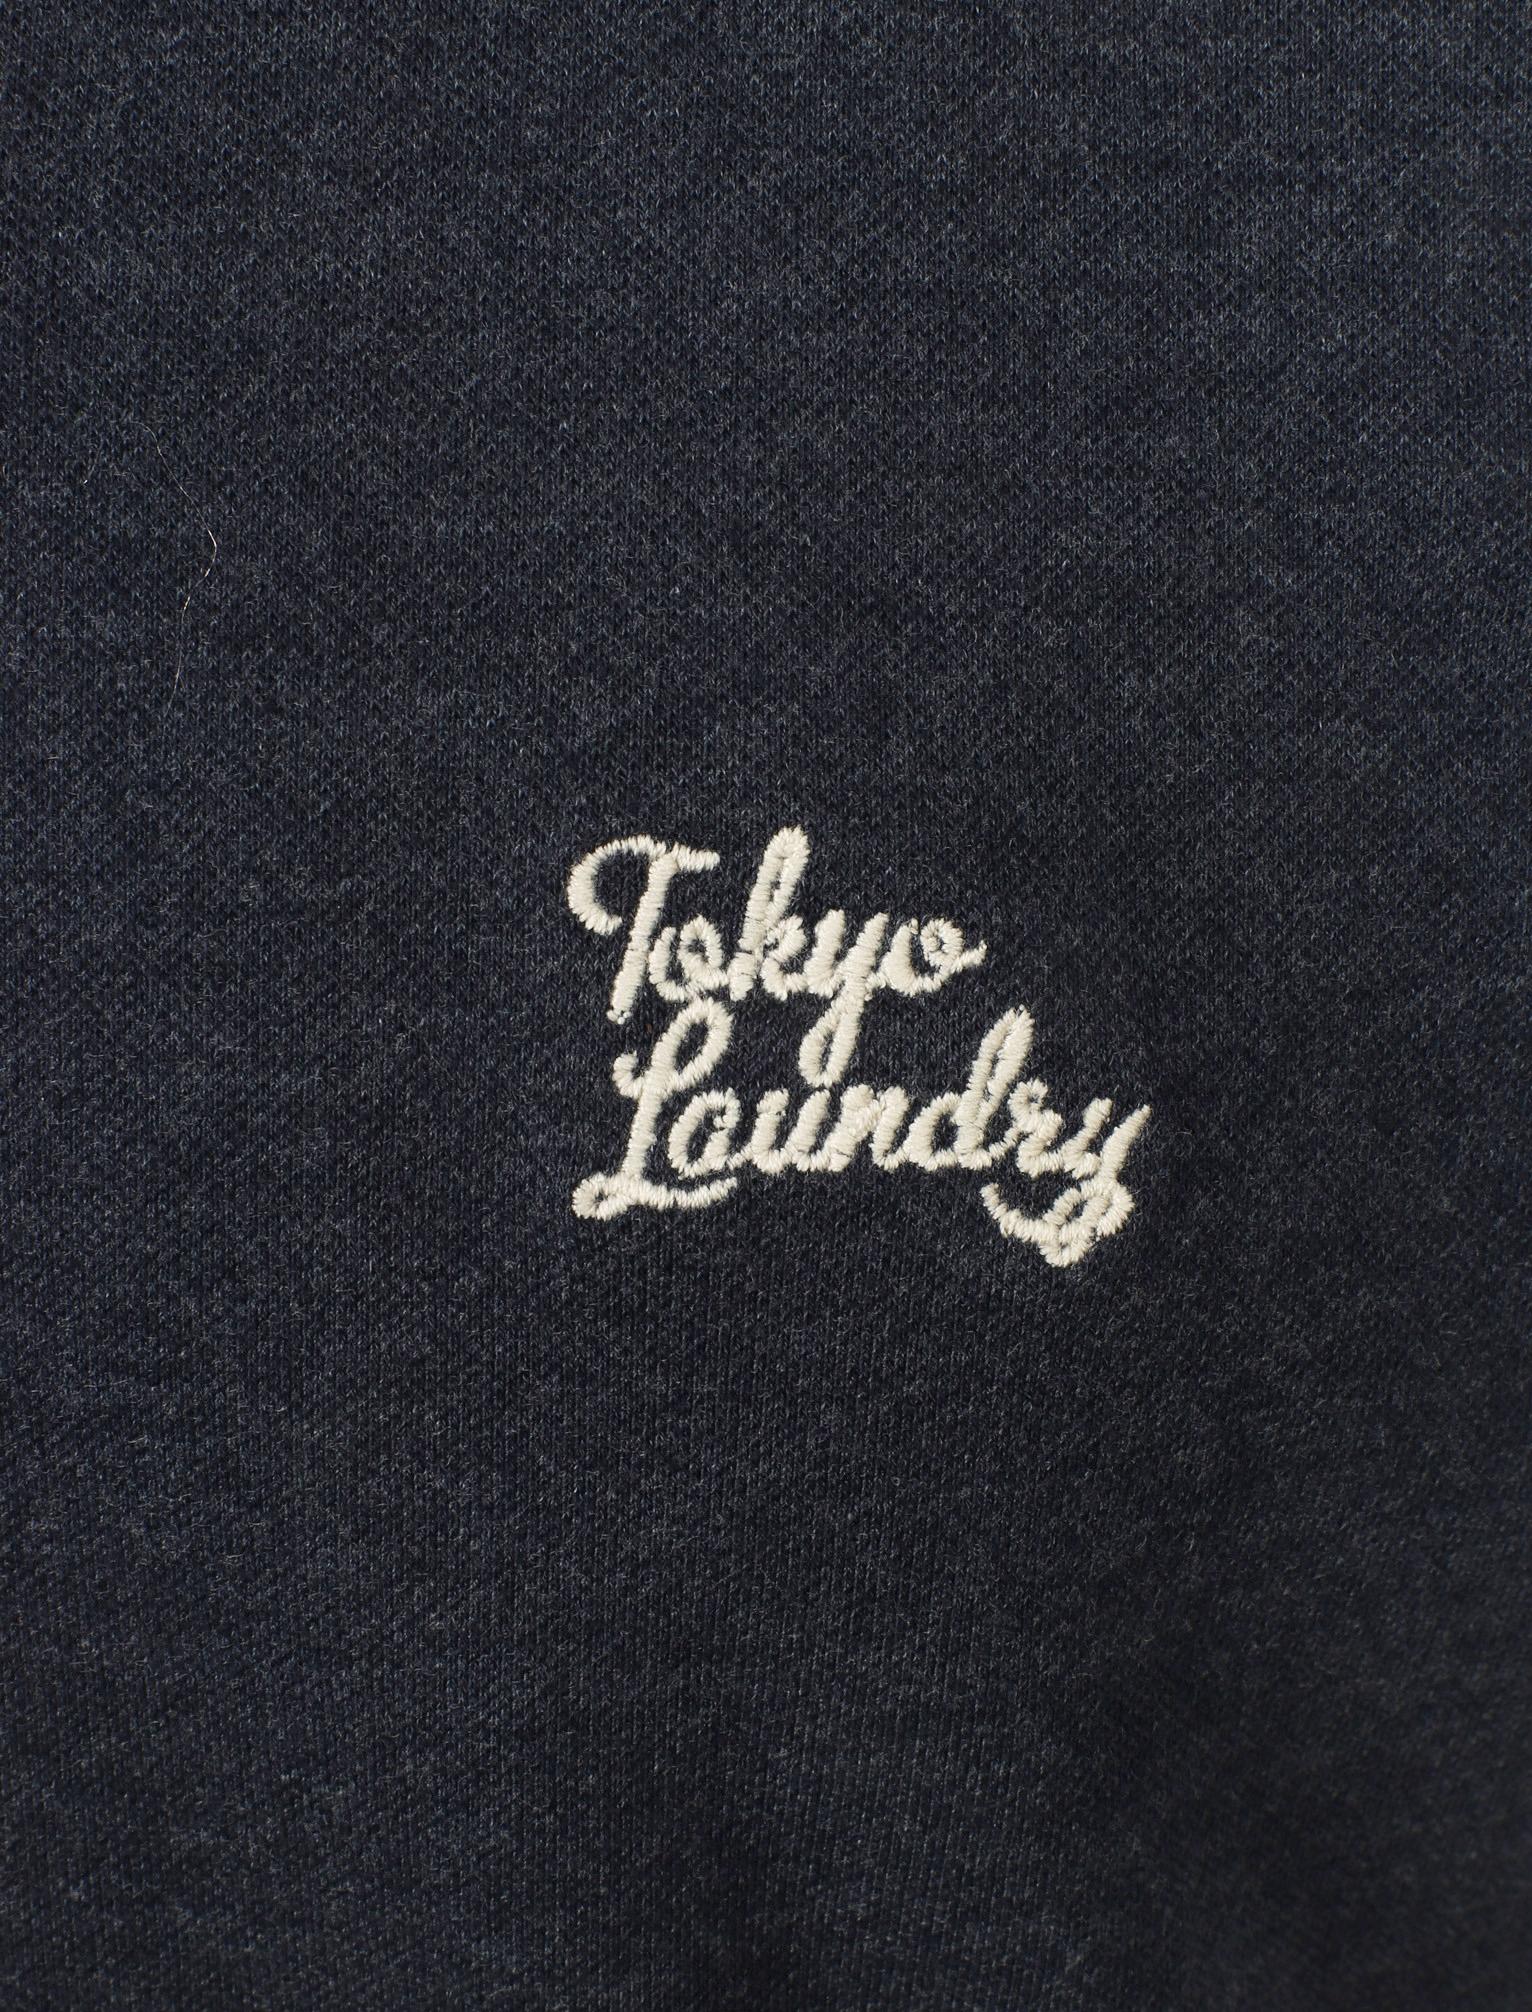 New-Mens-Tokyo-Laundry-Branded-Kuusamo-Cotton-Rich-Pique-Polo-Shirt-Size-S-XXL thumbnail 14